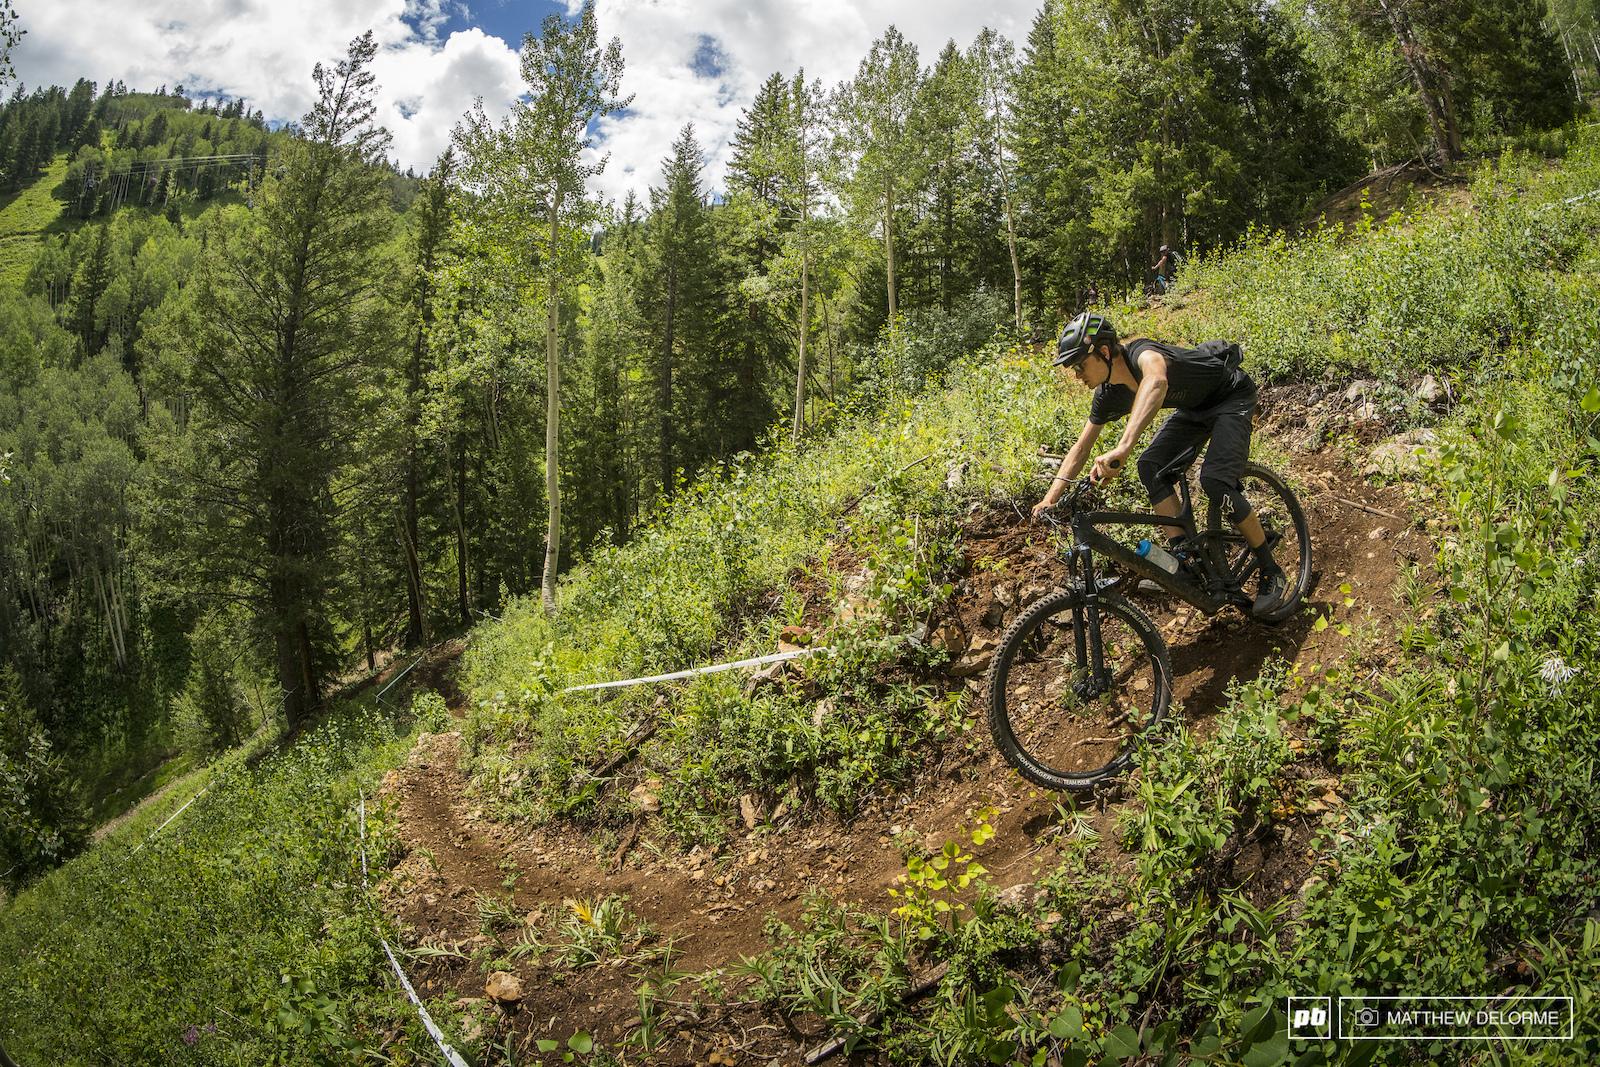 Duncan Philpott enjoying a rare bit of damp Colorado hero dirt.